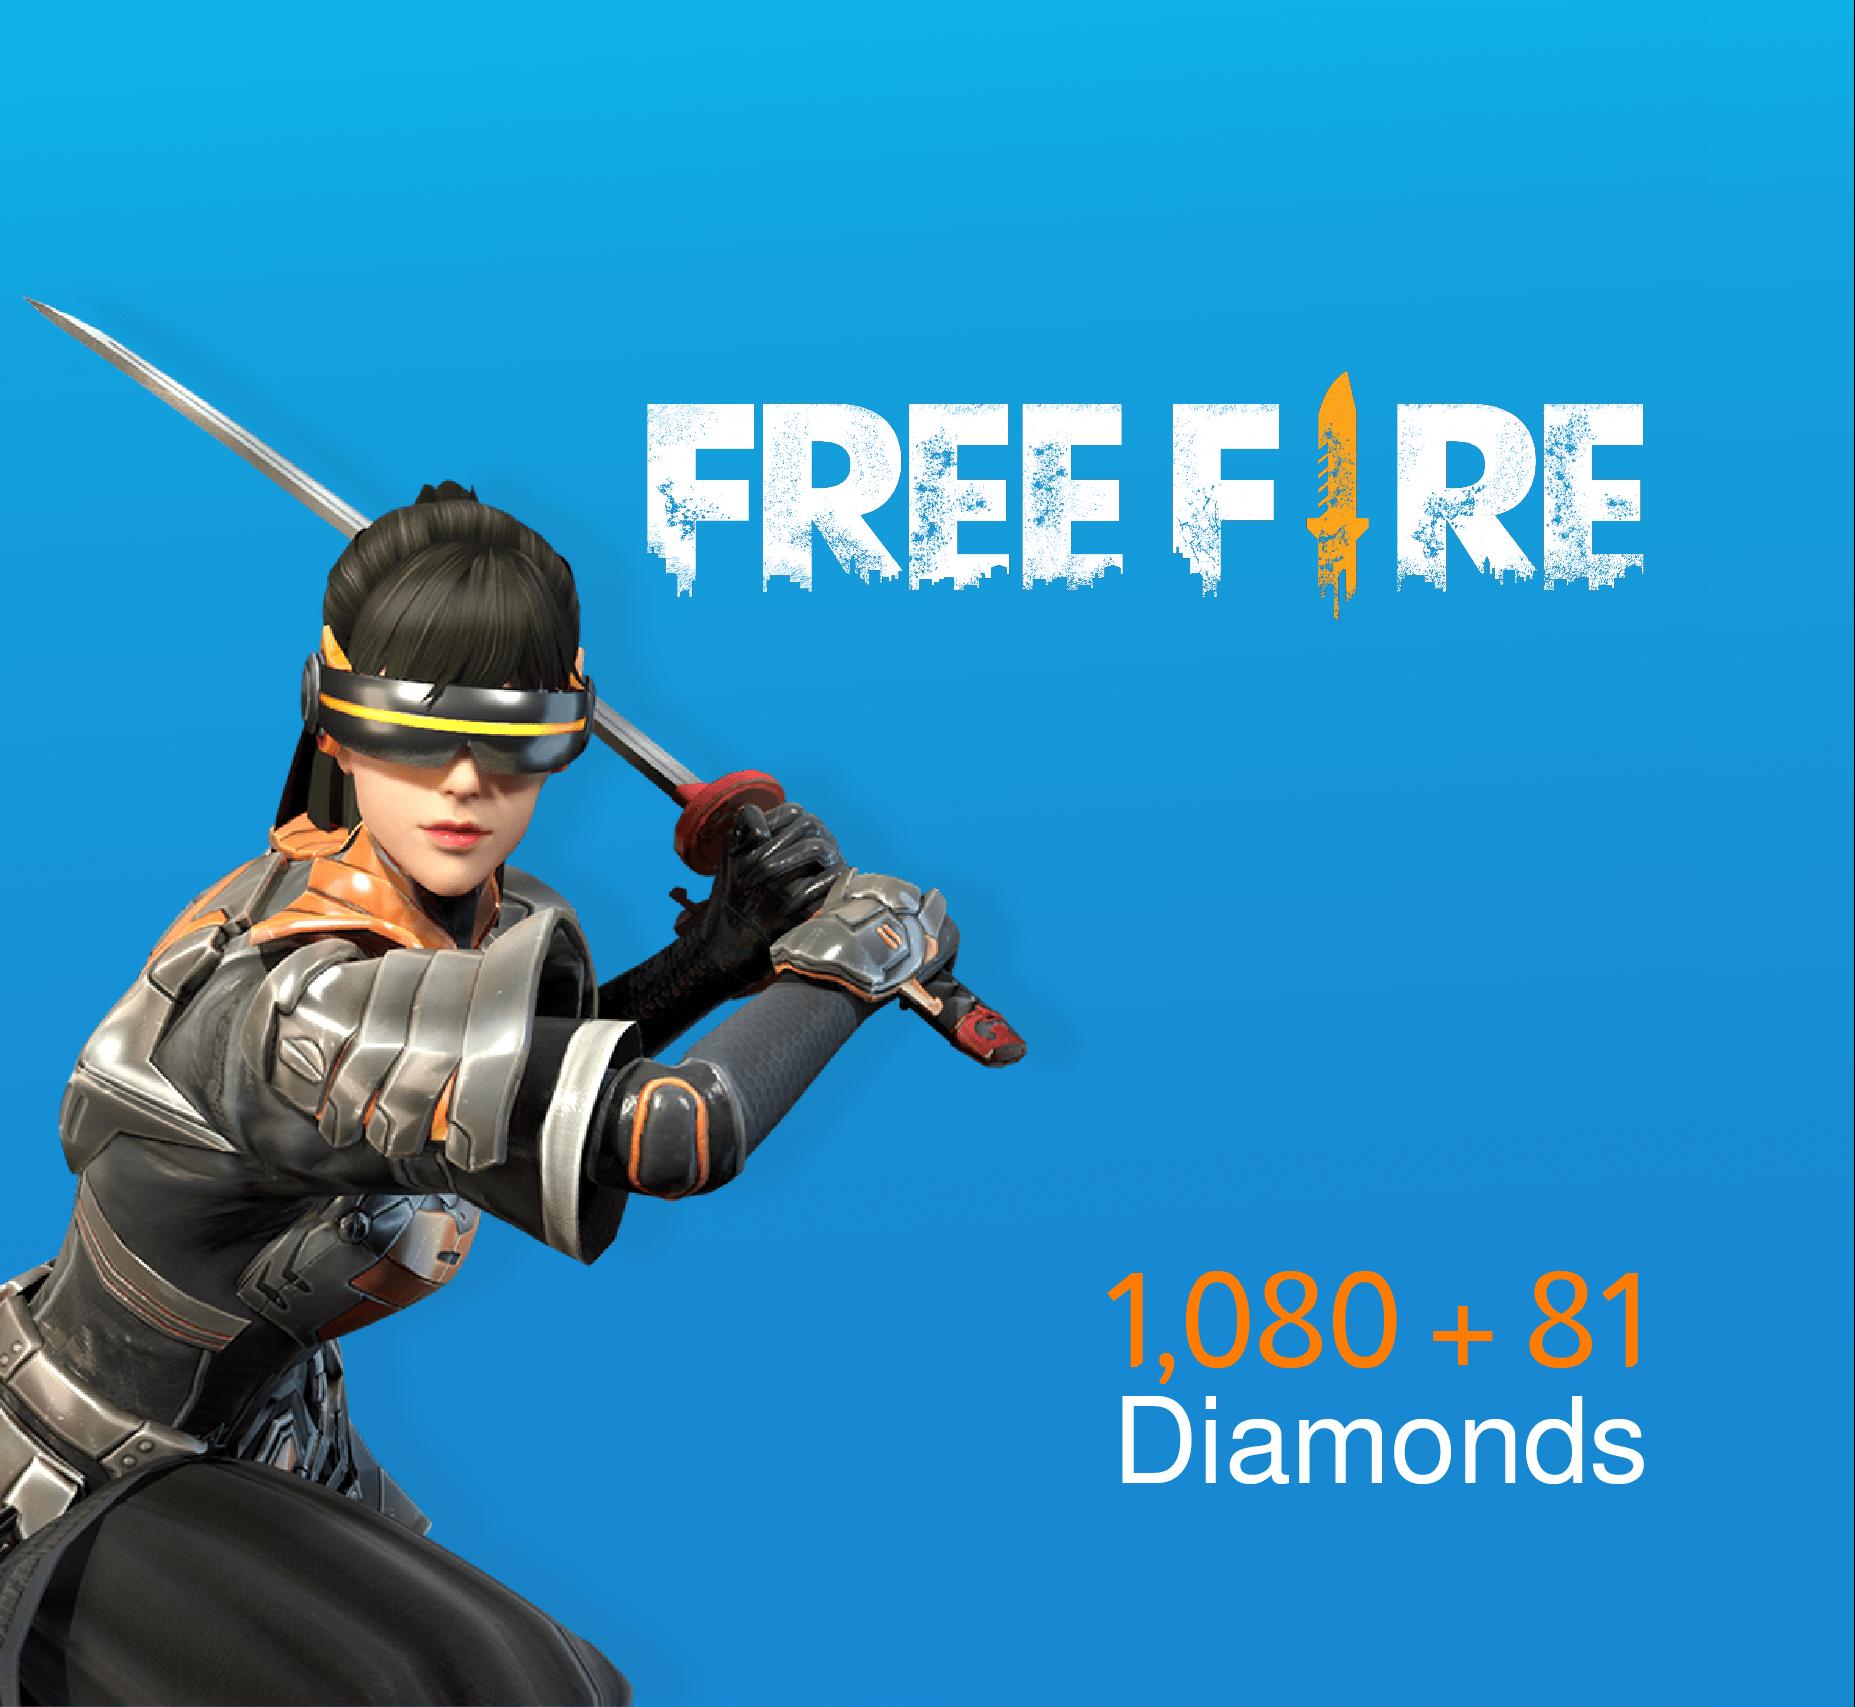 Free Fire Pins 1080 + 81 Diamonds